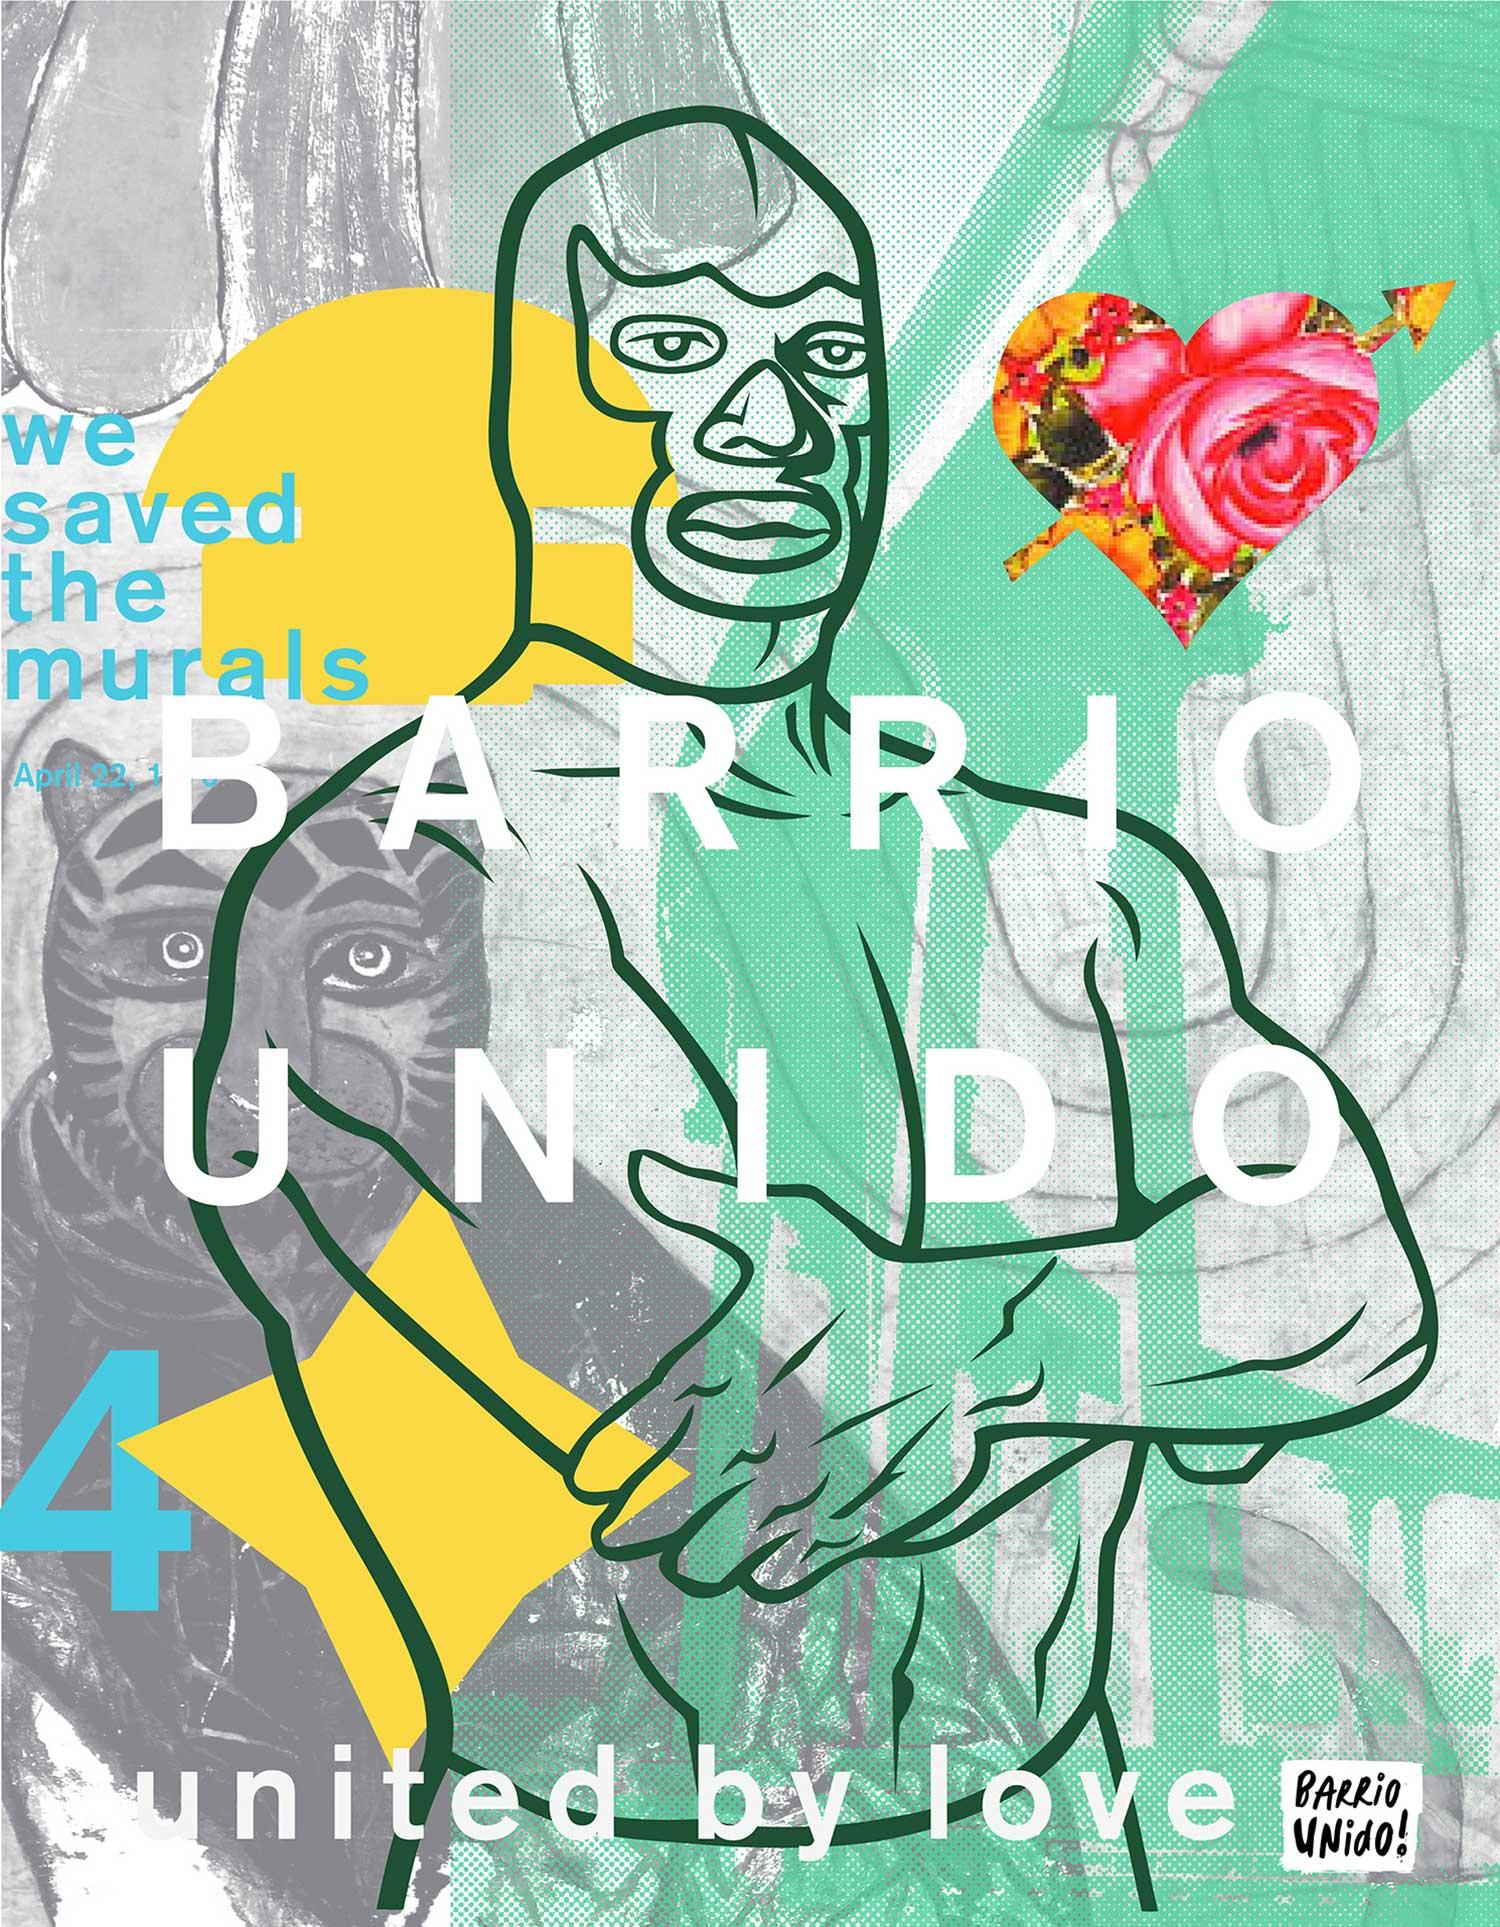 ron-miriello-grafico-barrio-logan-posters-san-diego-community-design-Miriello-branding-officina-01.jpg